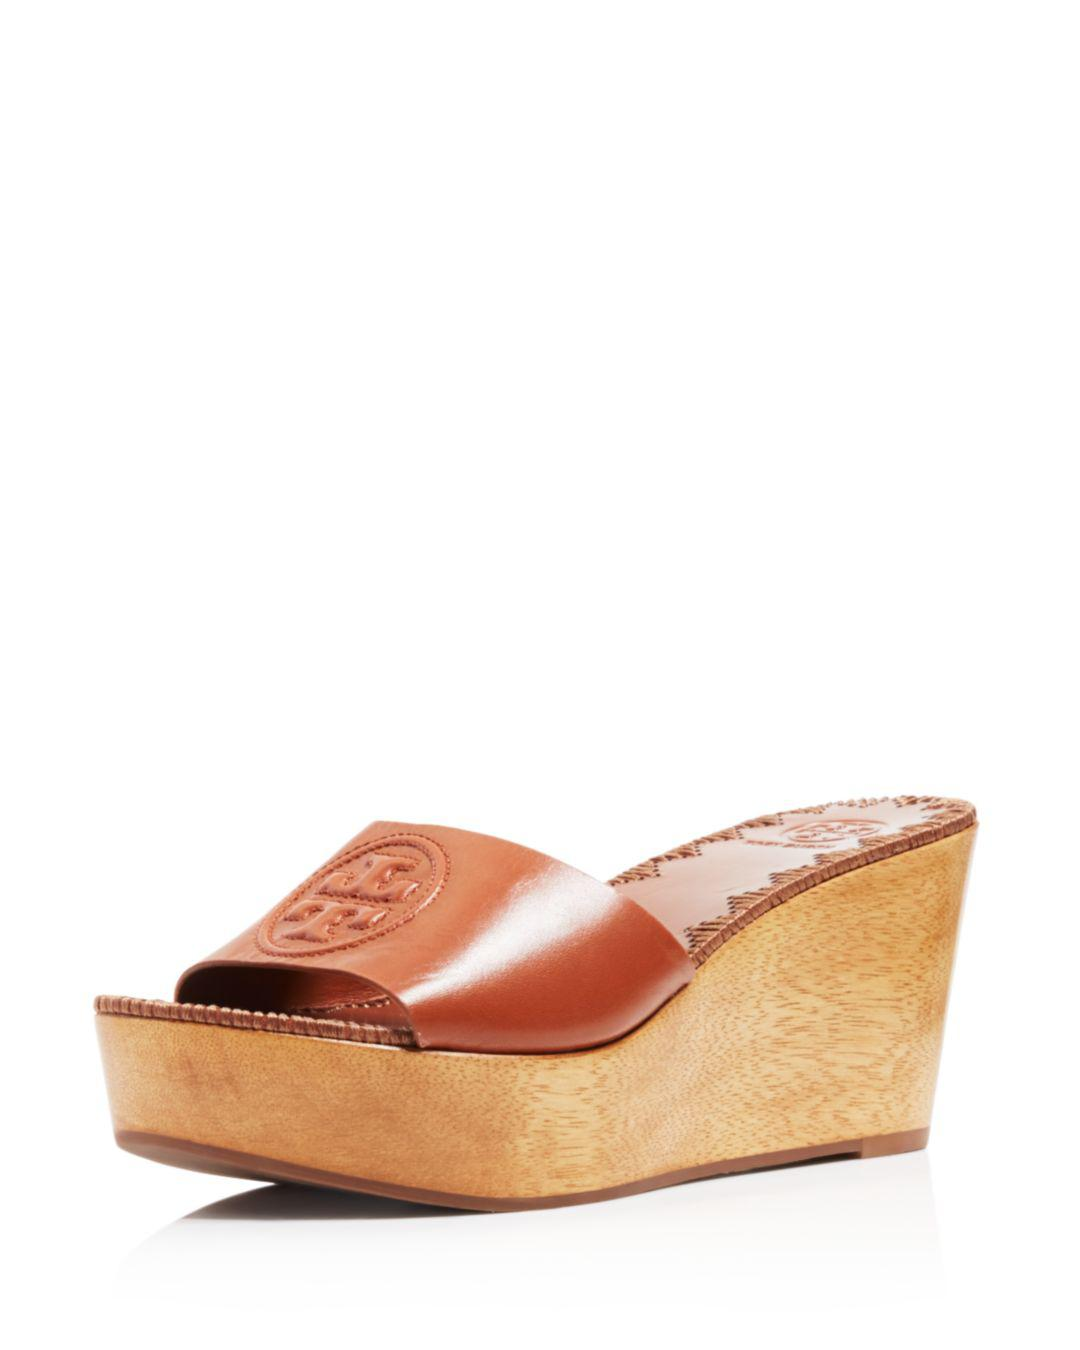 9d90a426c6d6 Tory Burch Women s Patty Leather Platform Wedge Slide Sandals - Lyst